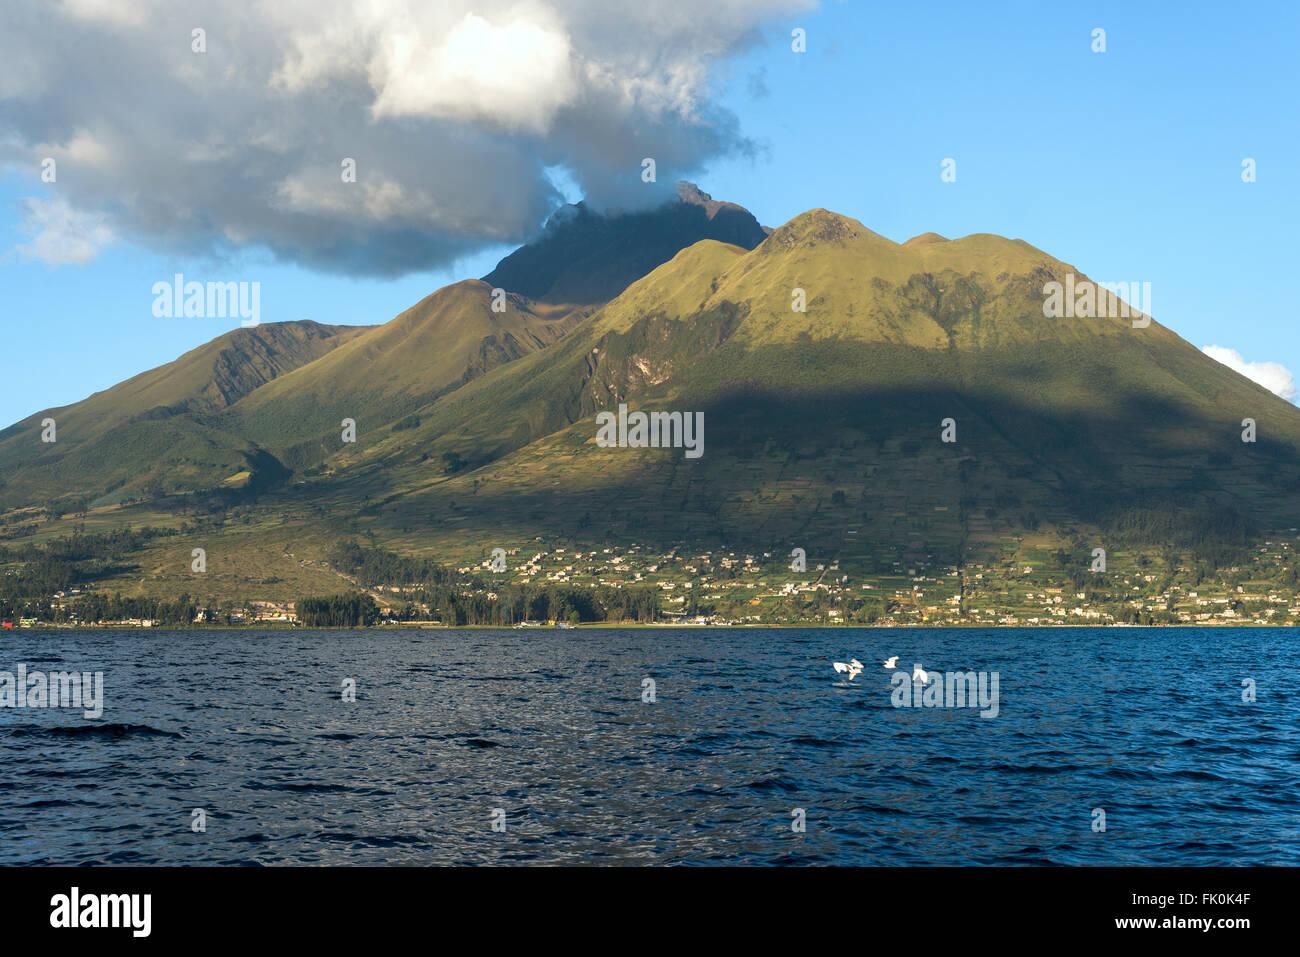 Imbabura inactive stratovolcano under the Lake San Pablo in northern Ecuador - Stock Image